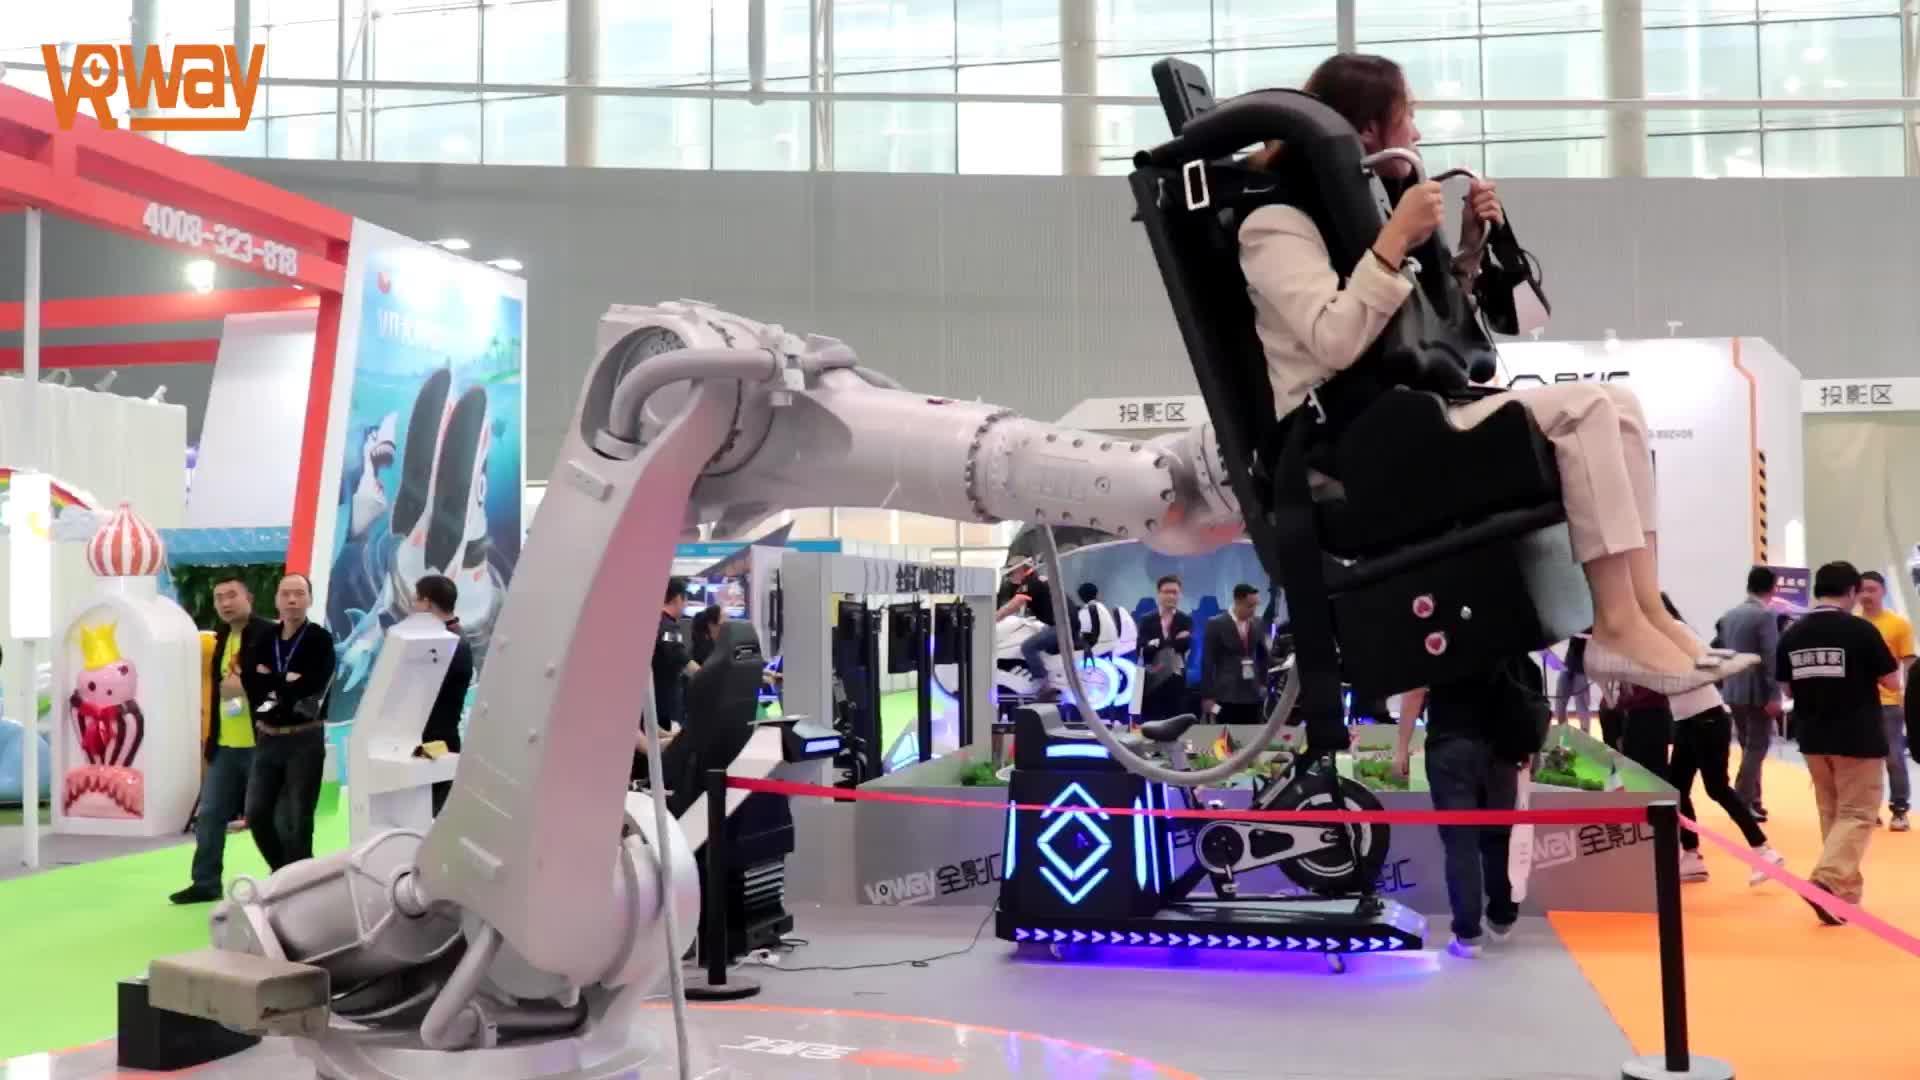 2020 VRway 360 תואר סיבוב 6dof רובוט מכאני זרוע vr למכירה